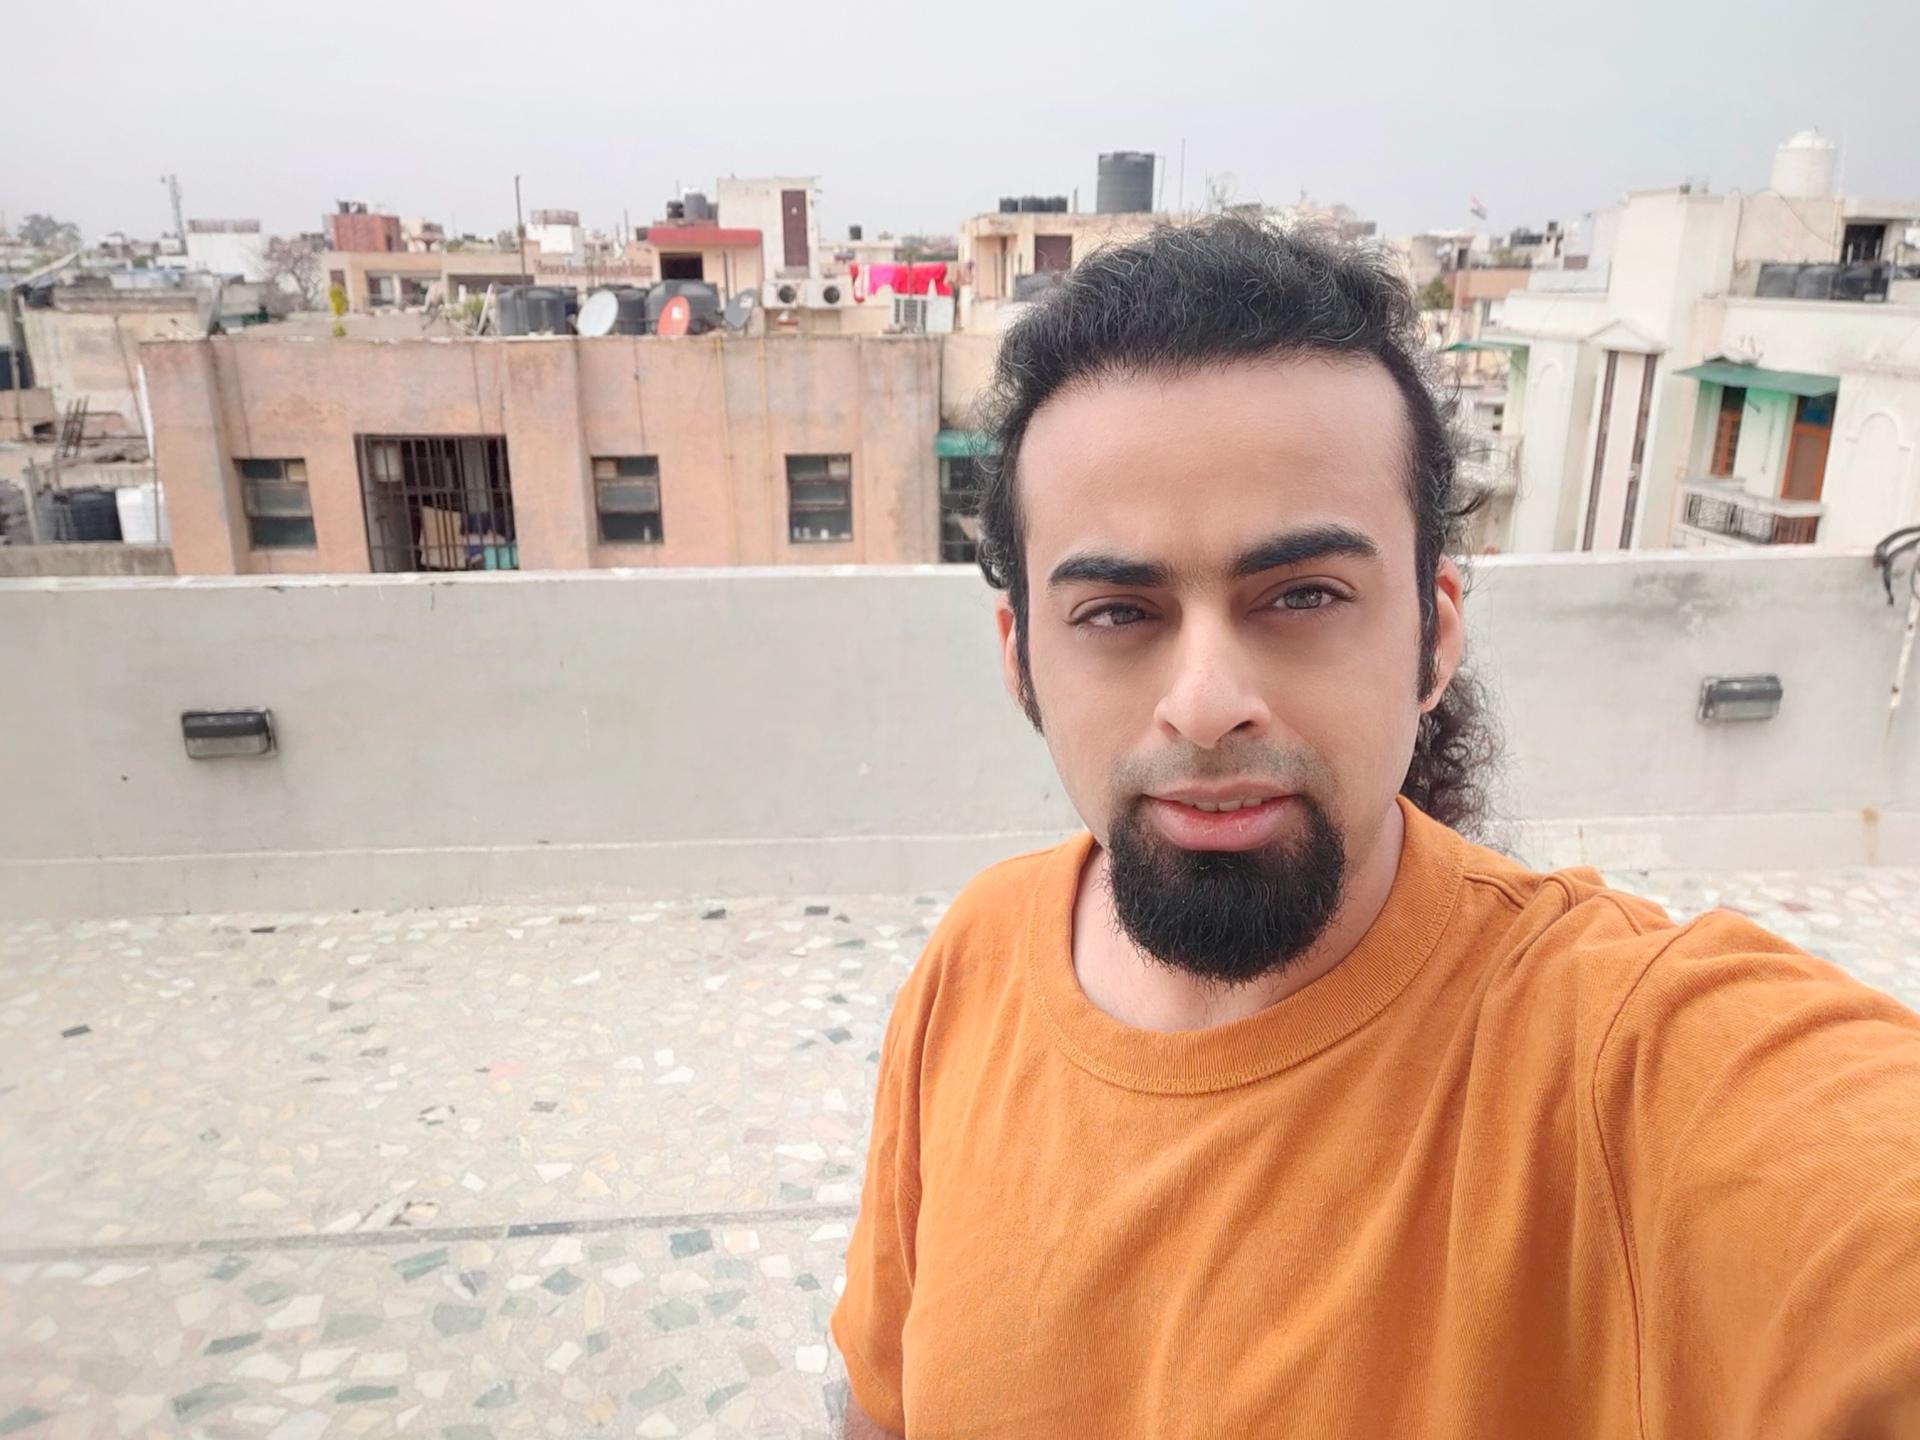 Realme 6 Pro selfie main